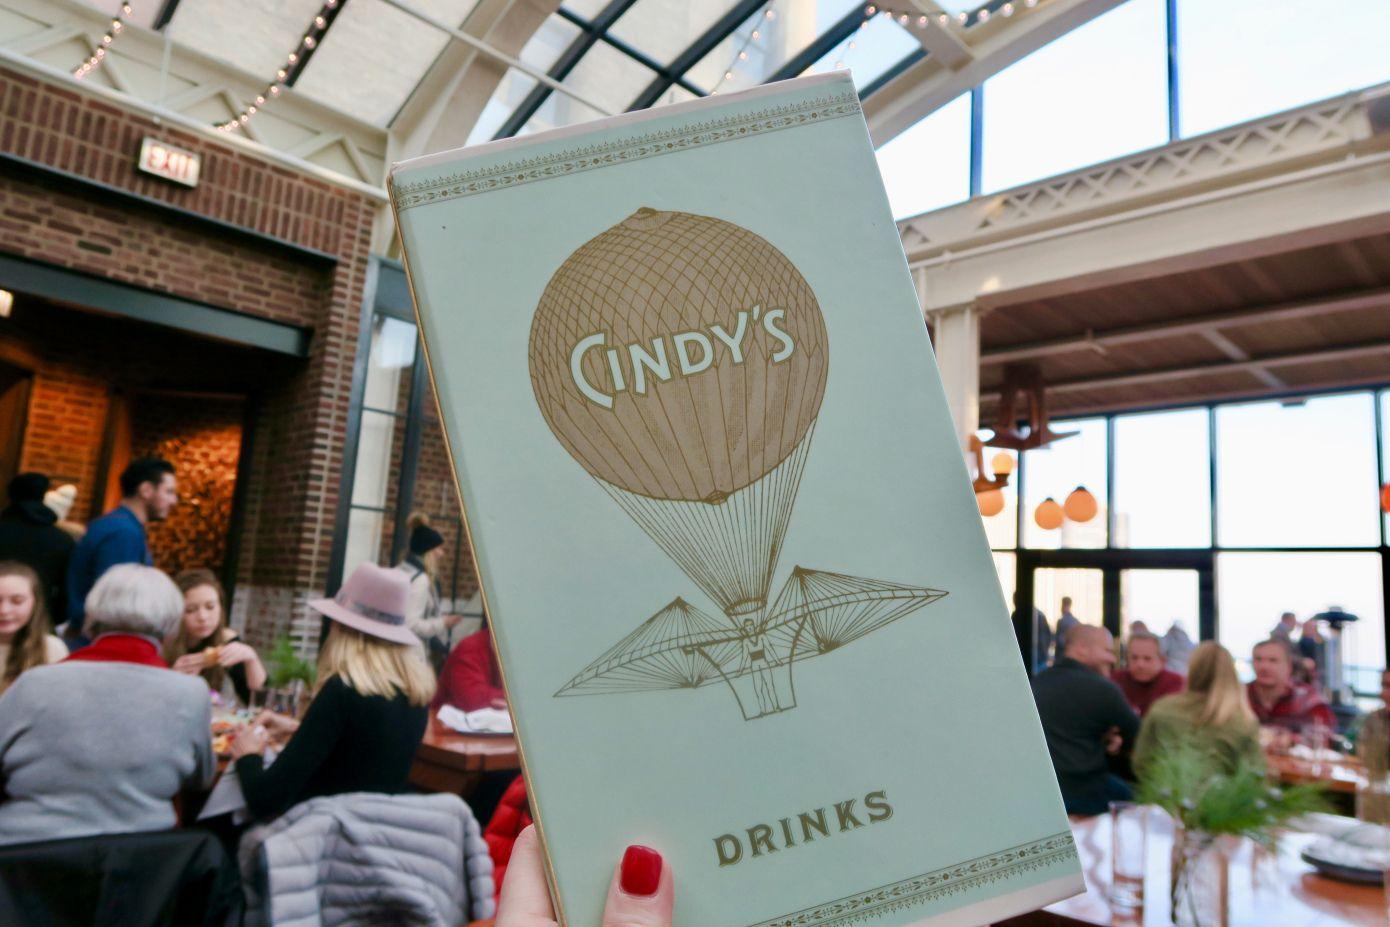 Cindy's | Chicago travel, Chicago restaurants, Rooftop ...